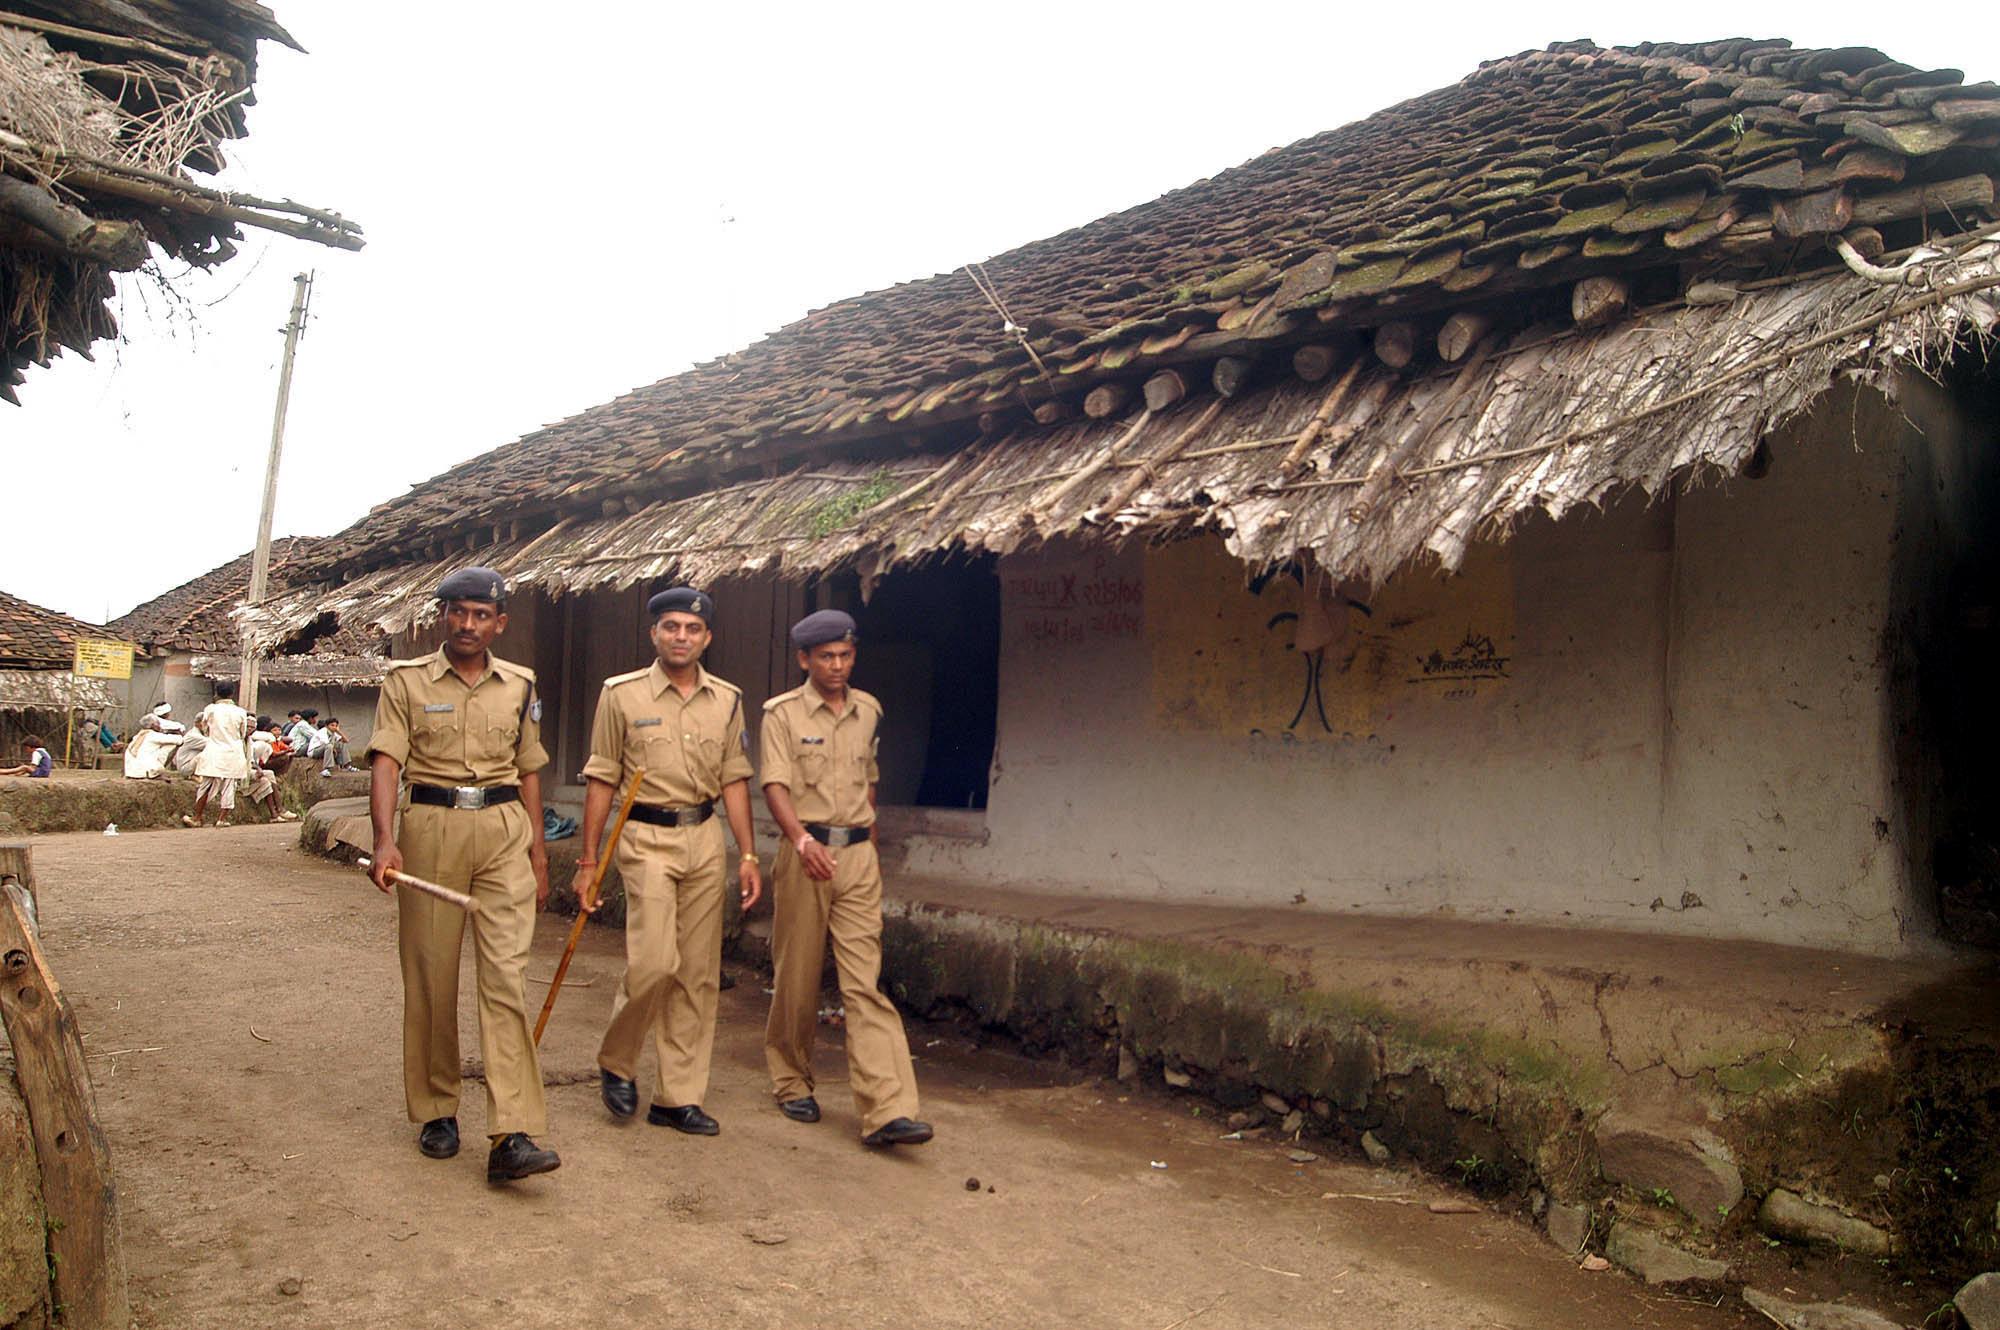 Bhopal Man Finds 'Mummified' Dead Body In Flat He Bought Eight Months